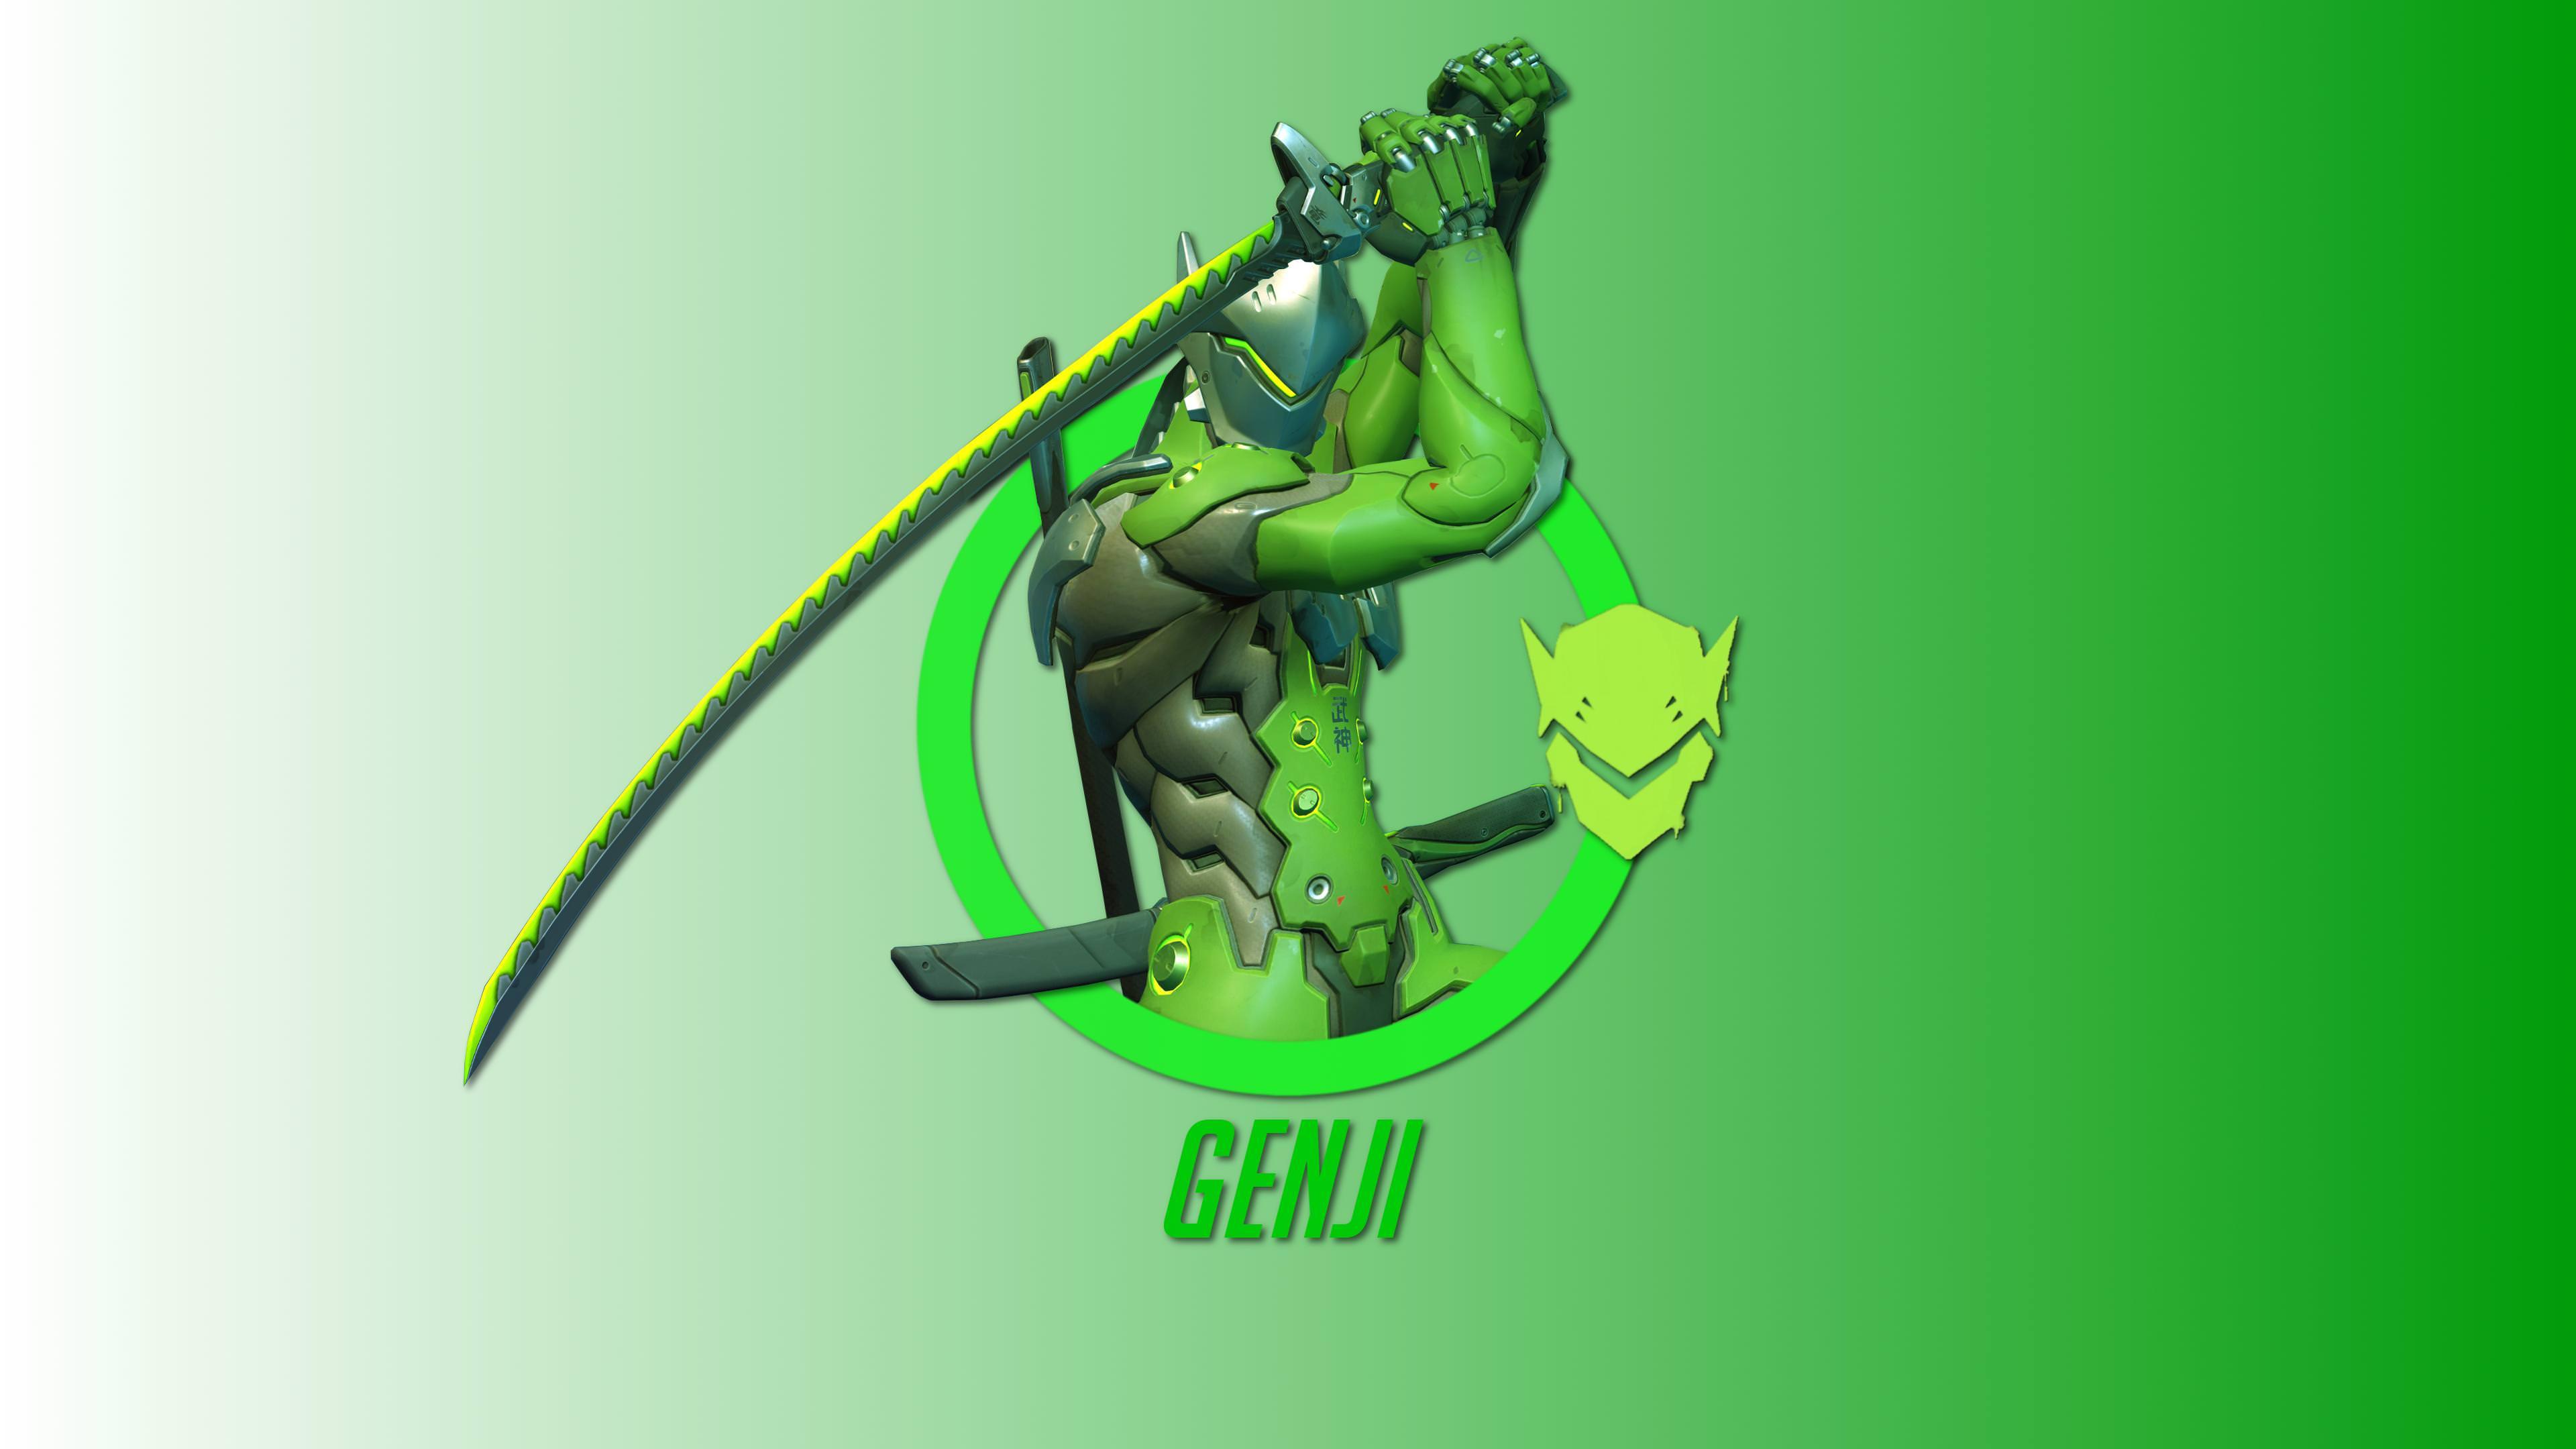 Genji Overwatch Hero 4k, HD Games, 4k